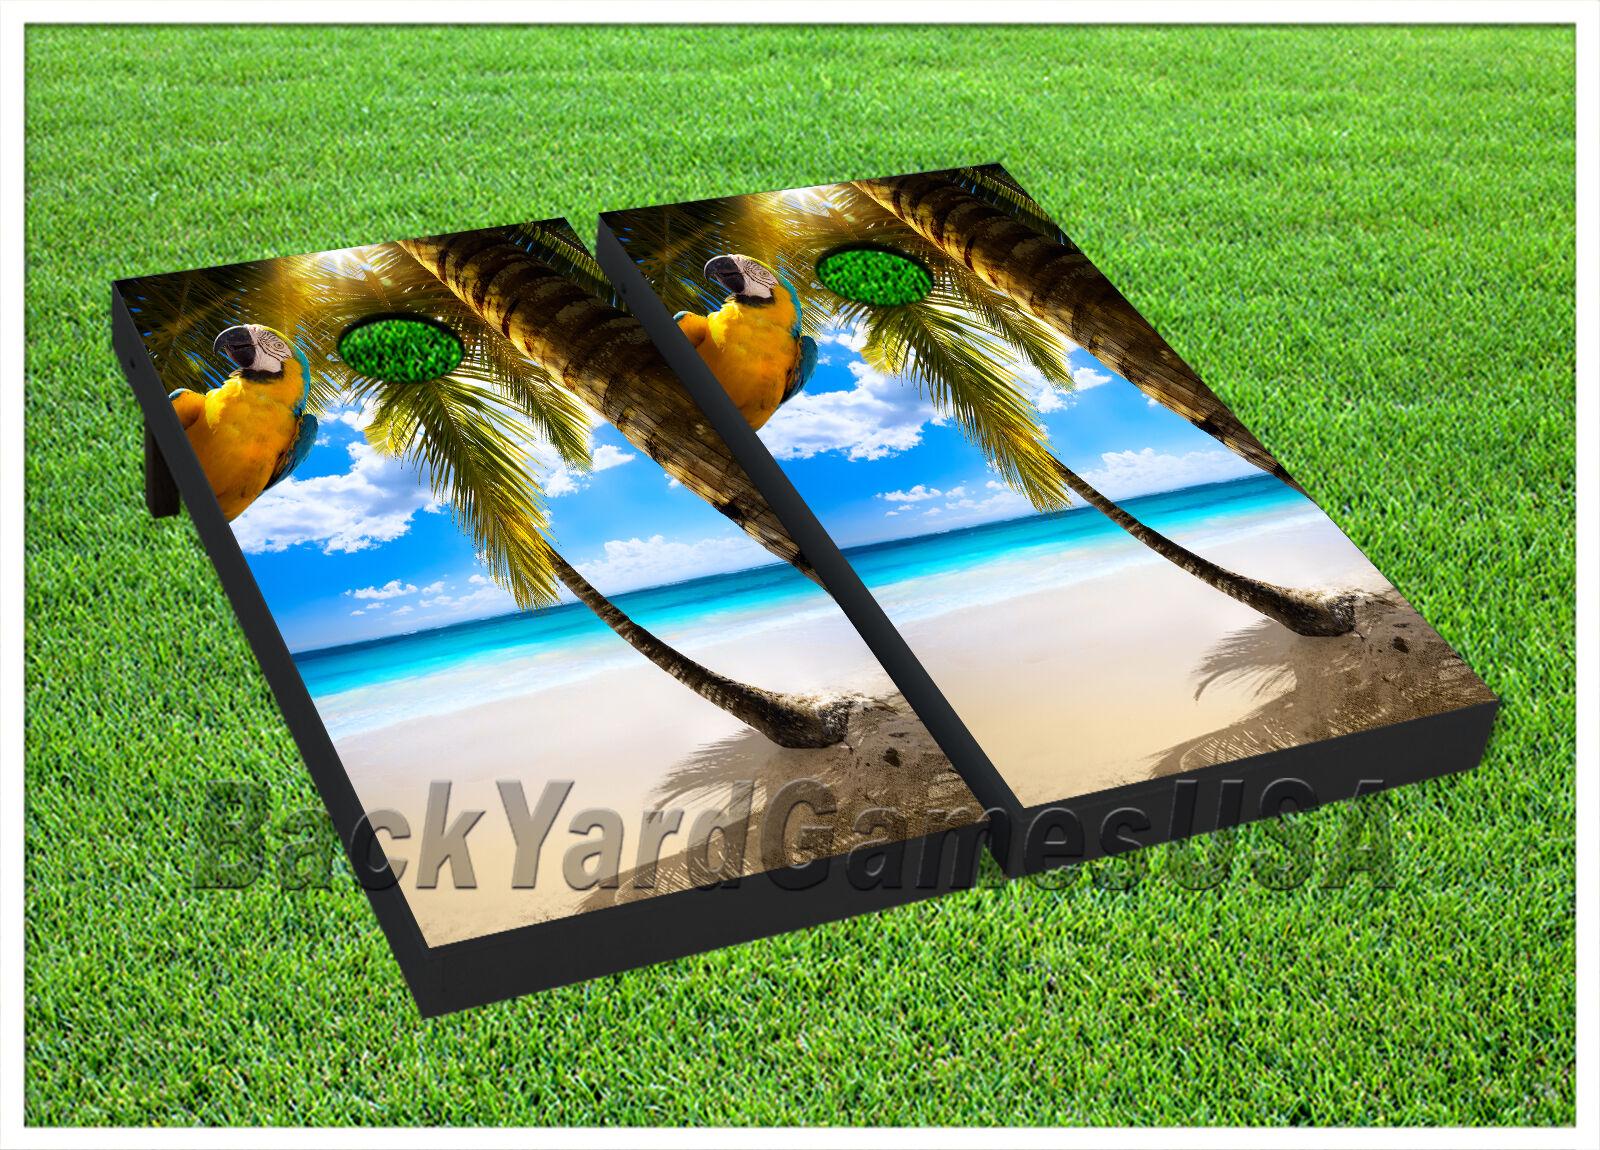 VINYL WRAPS CORNHOLE BEANBAG TOSS GAME Beach Paradise Game Board DECALS Set 884